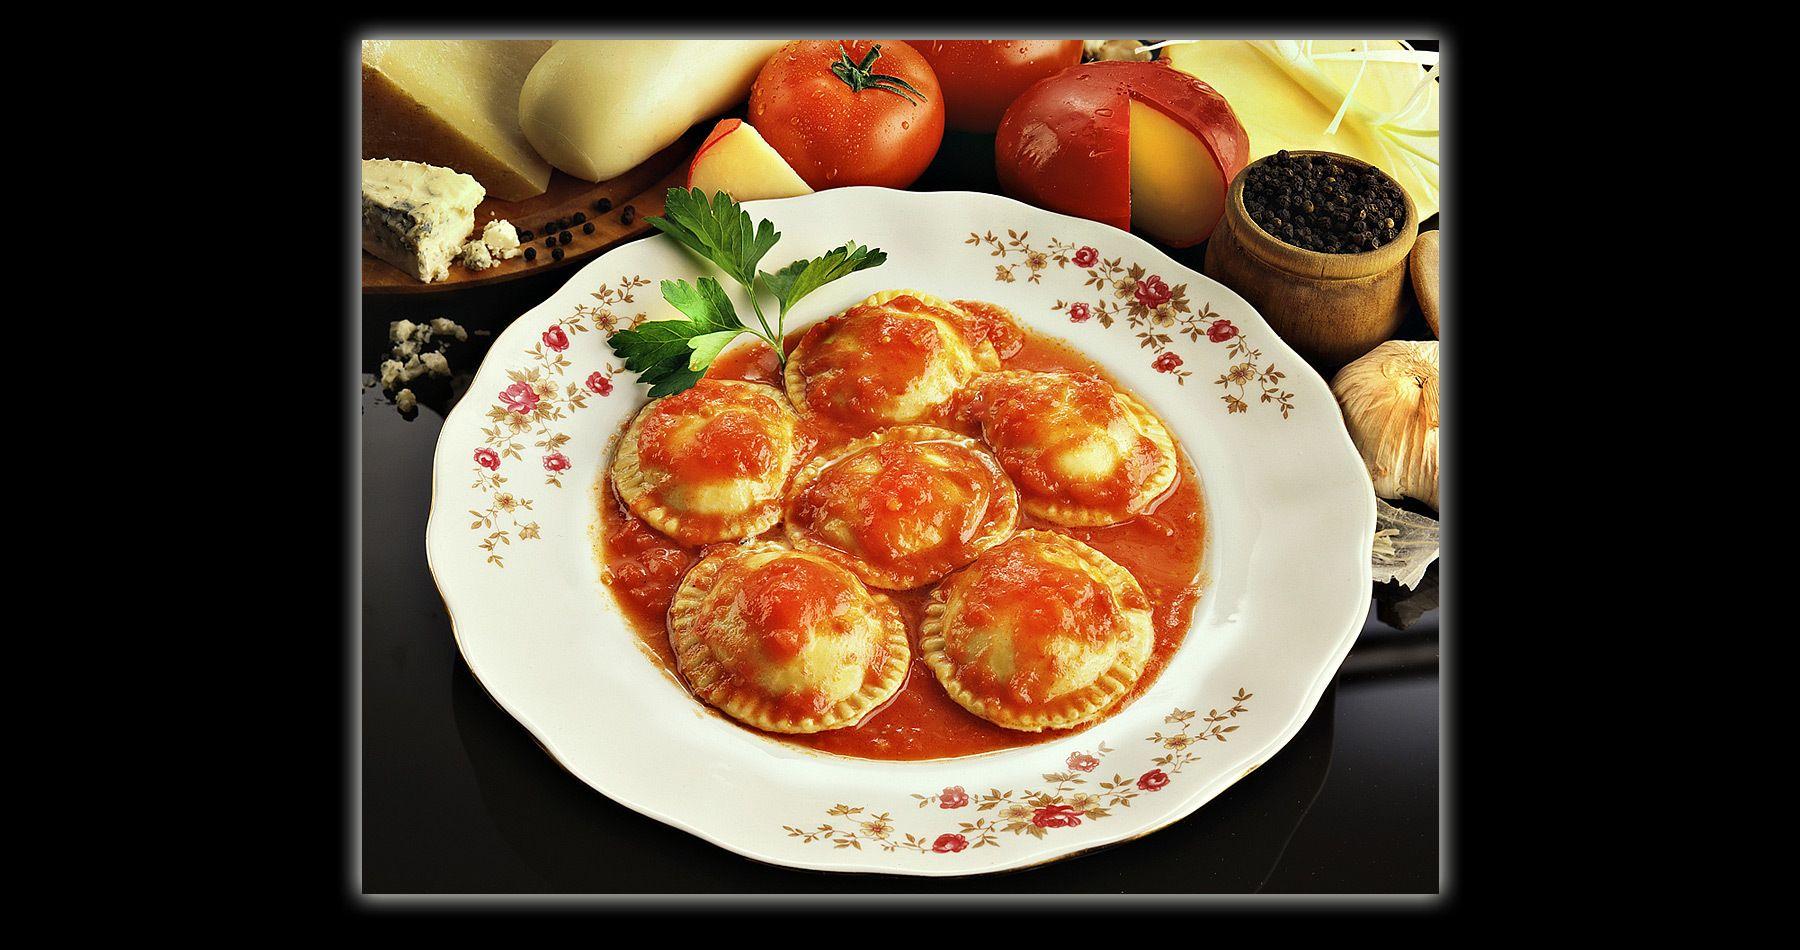 1guelph_photographer_food_6.jpg